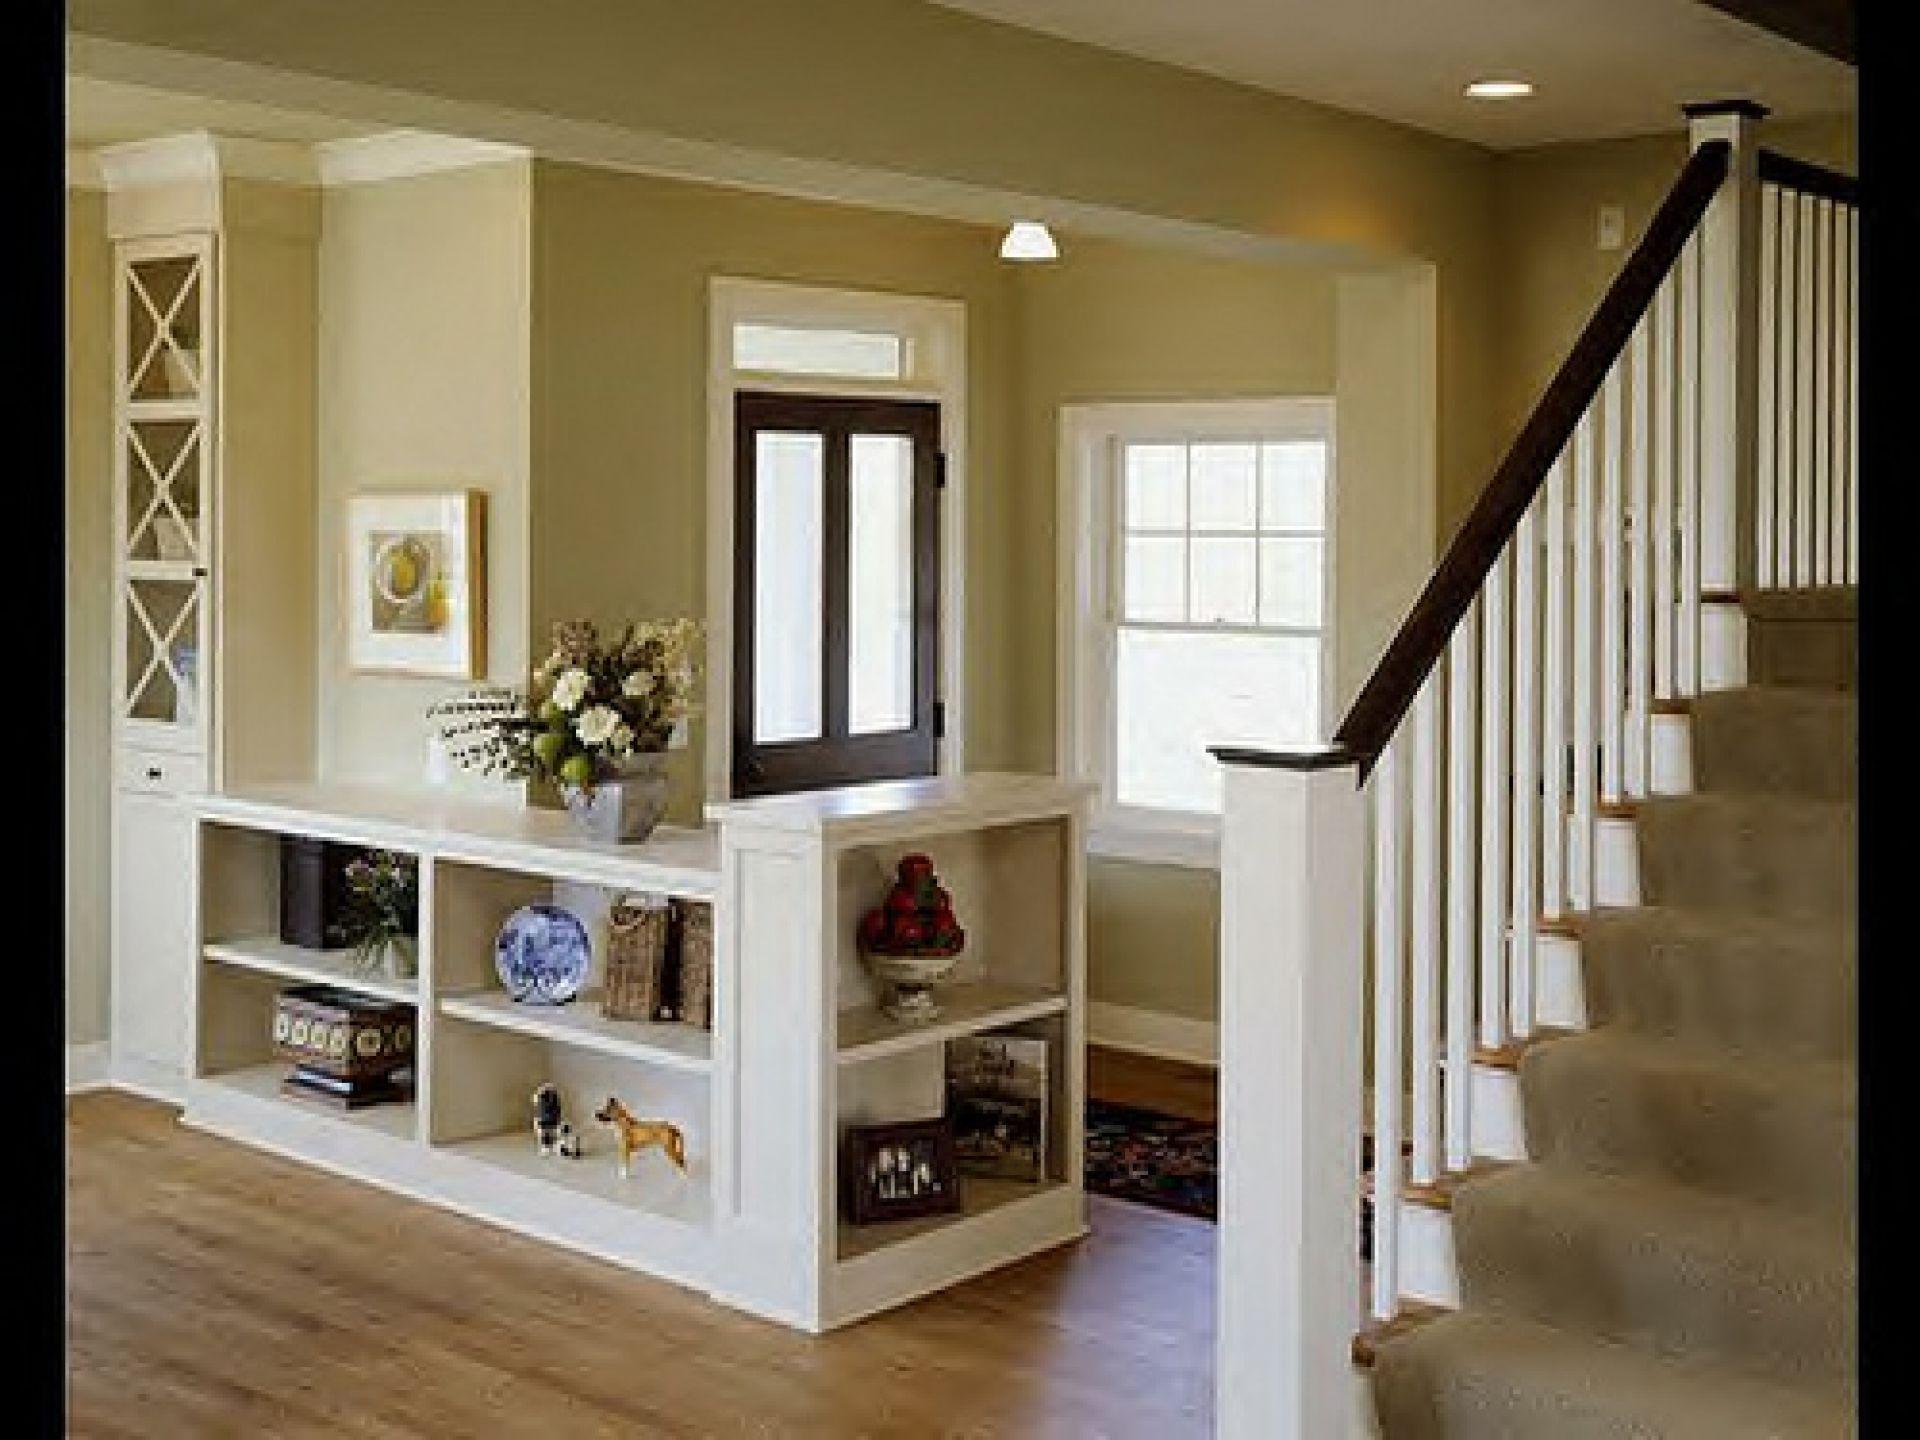 Icymi simple interior house design ideas pathologyandhistology